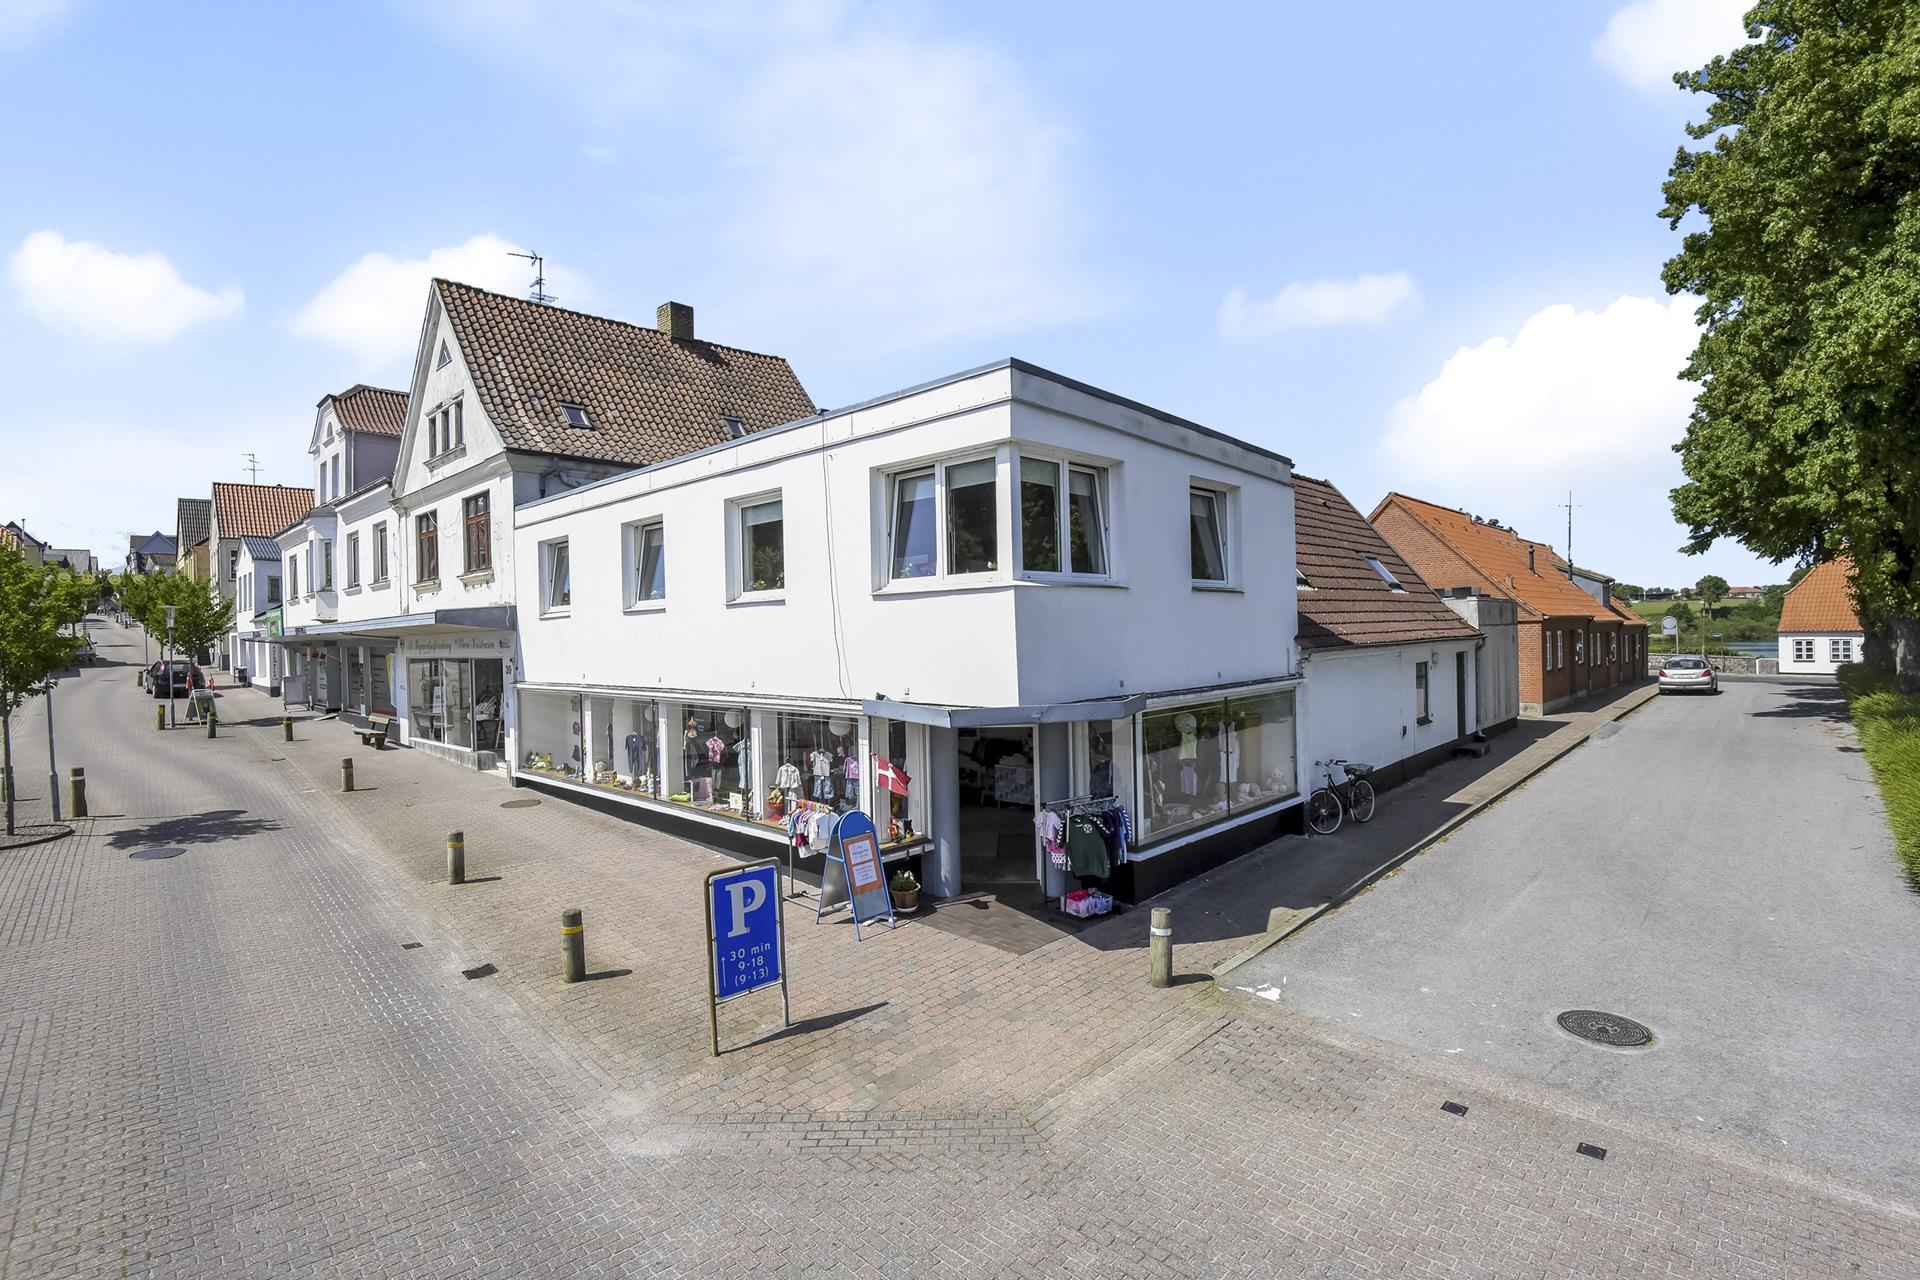 Bolig/erhverv på Ridepladsen i Nordborg - Andet